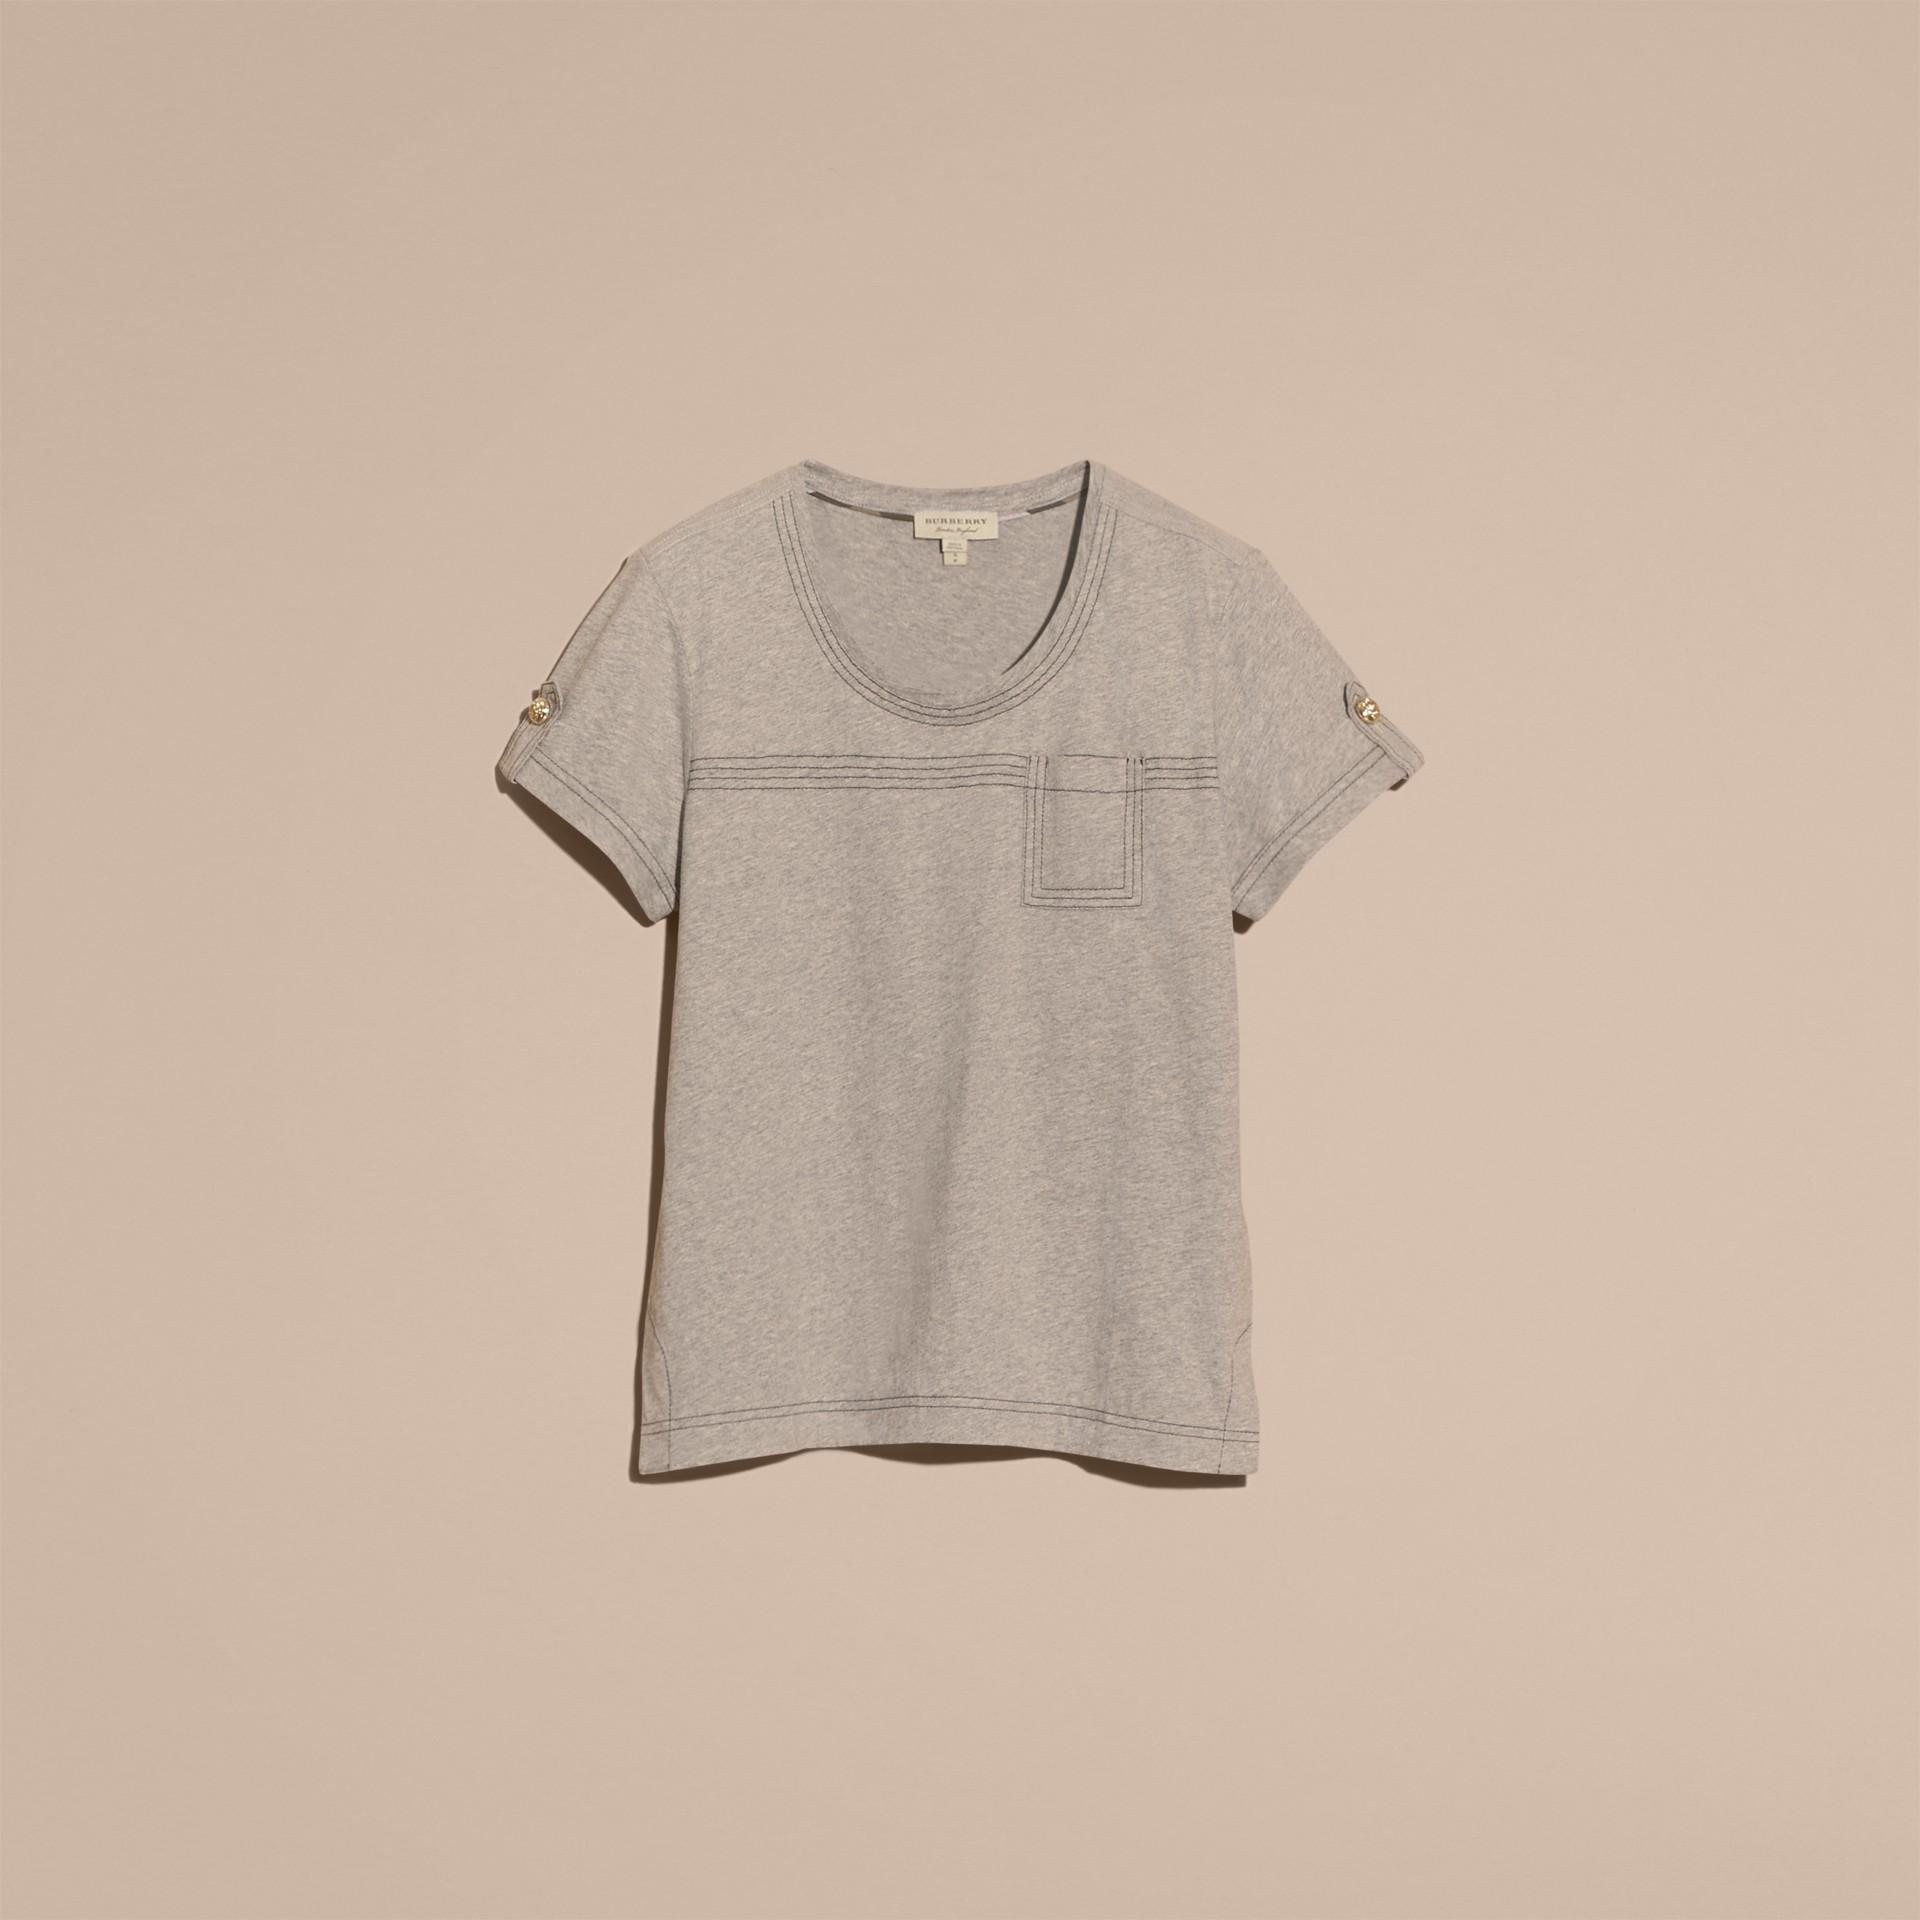 Pale grey melange Topstitch Detail Cotton T-shirt Pale Grey Melange - gallery image 4